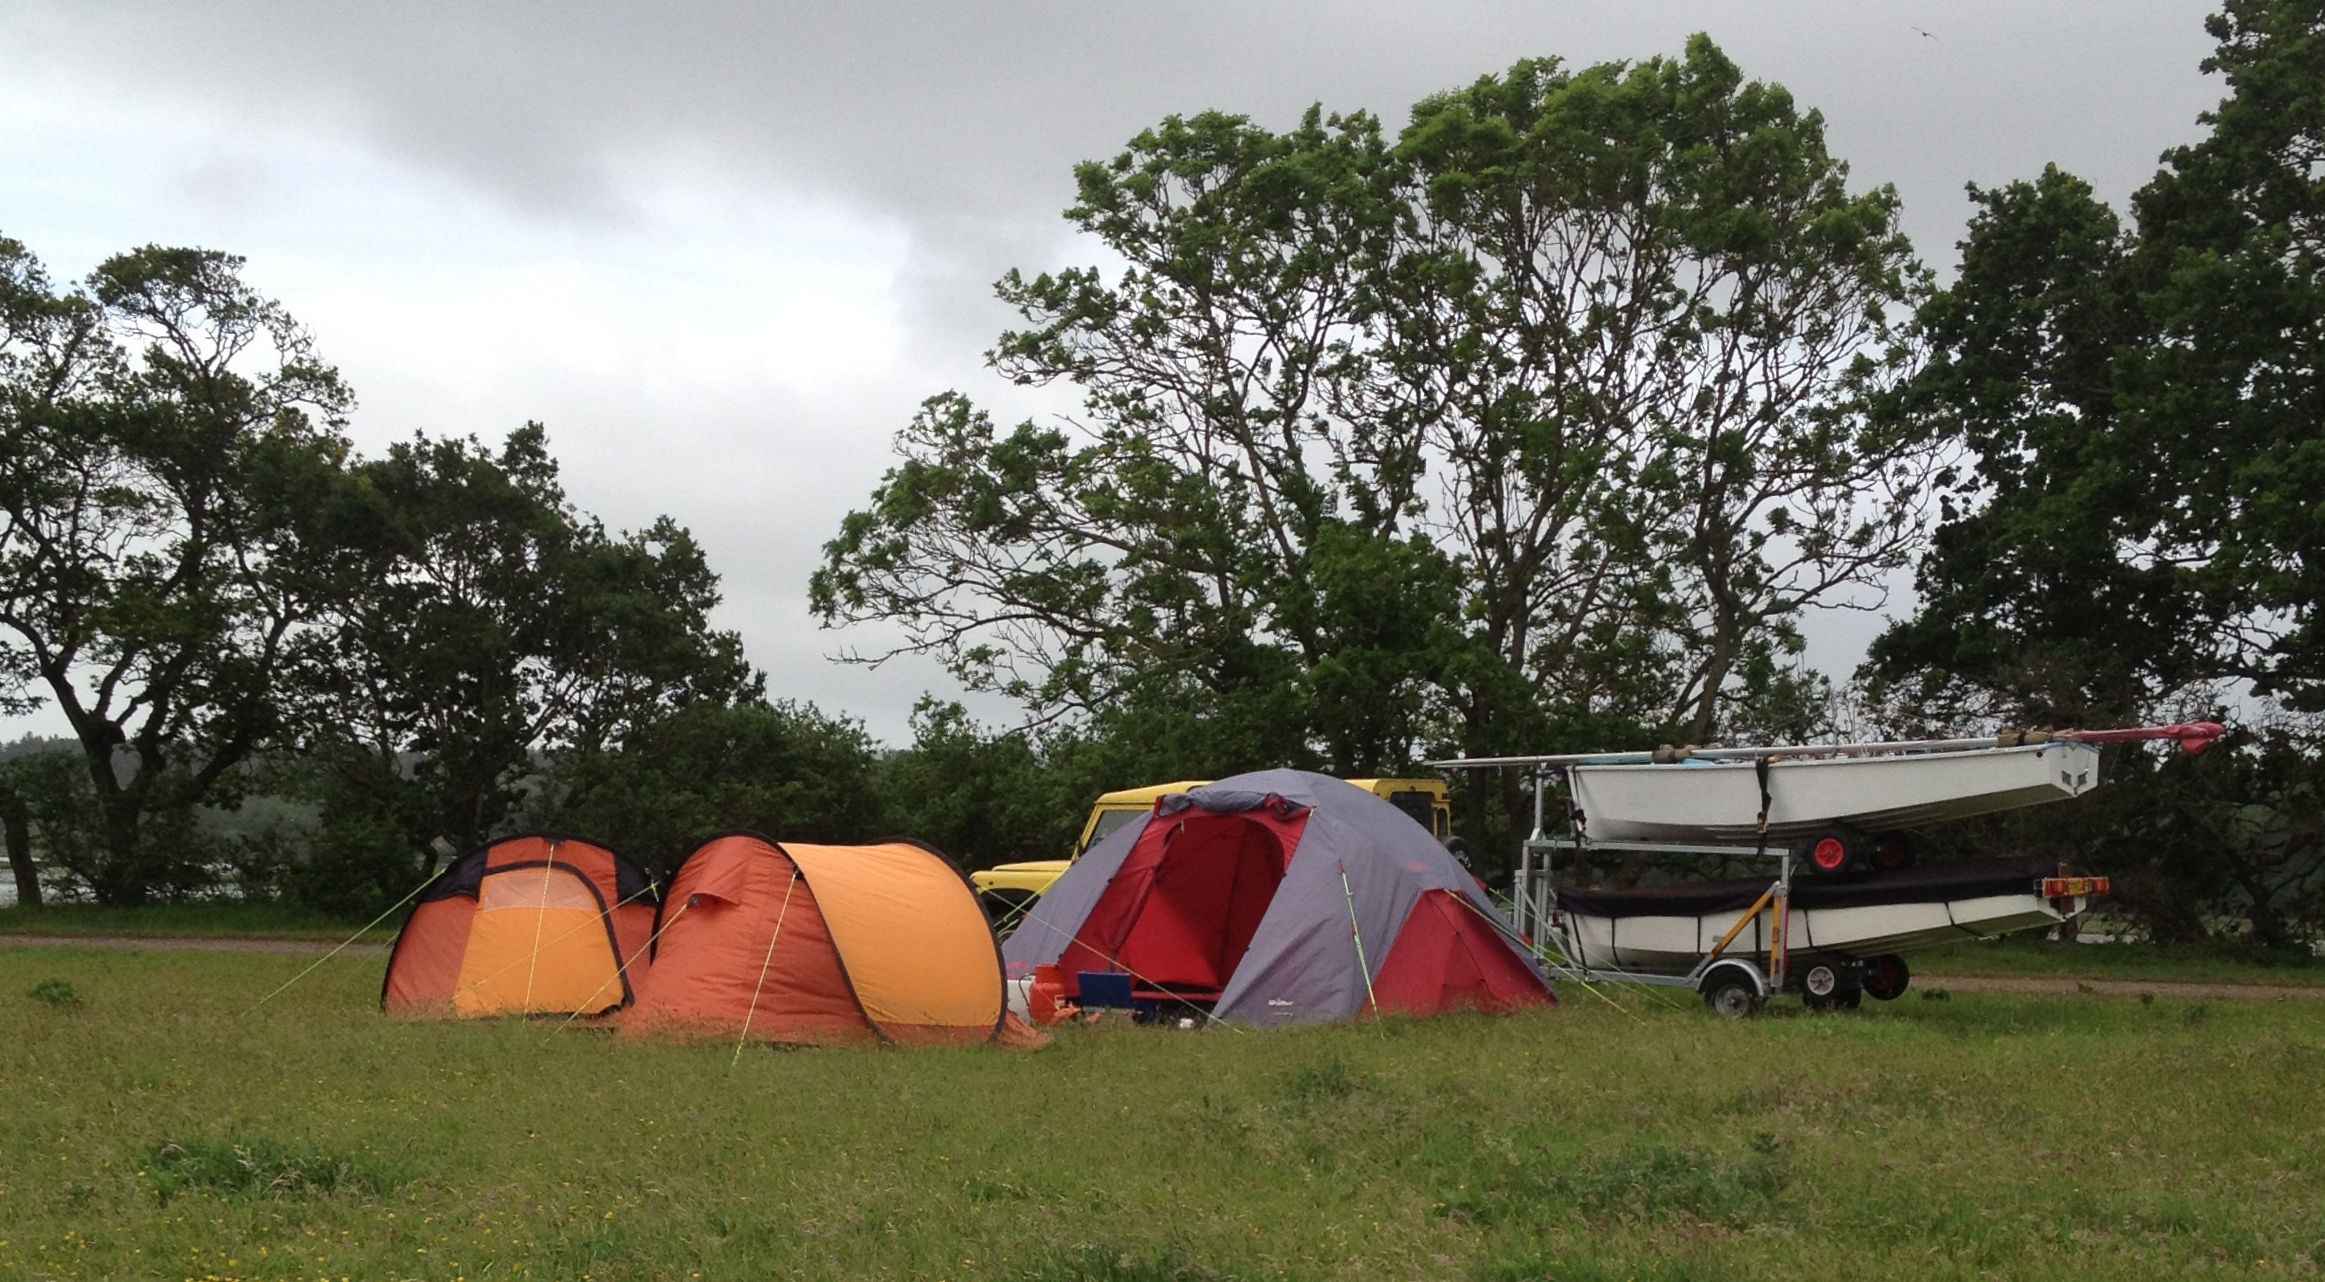 Camping at Poole